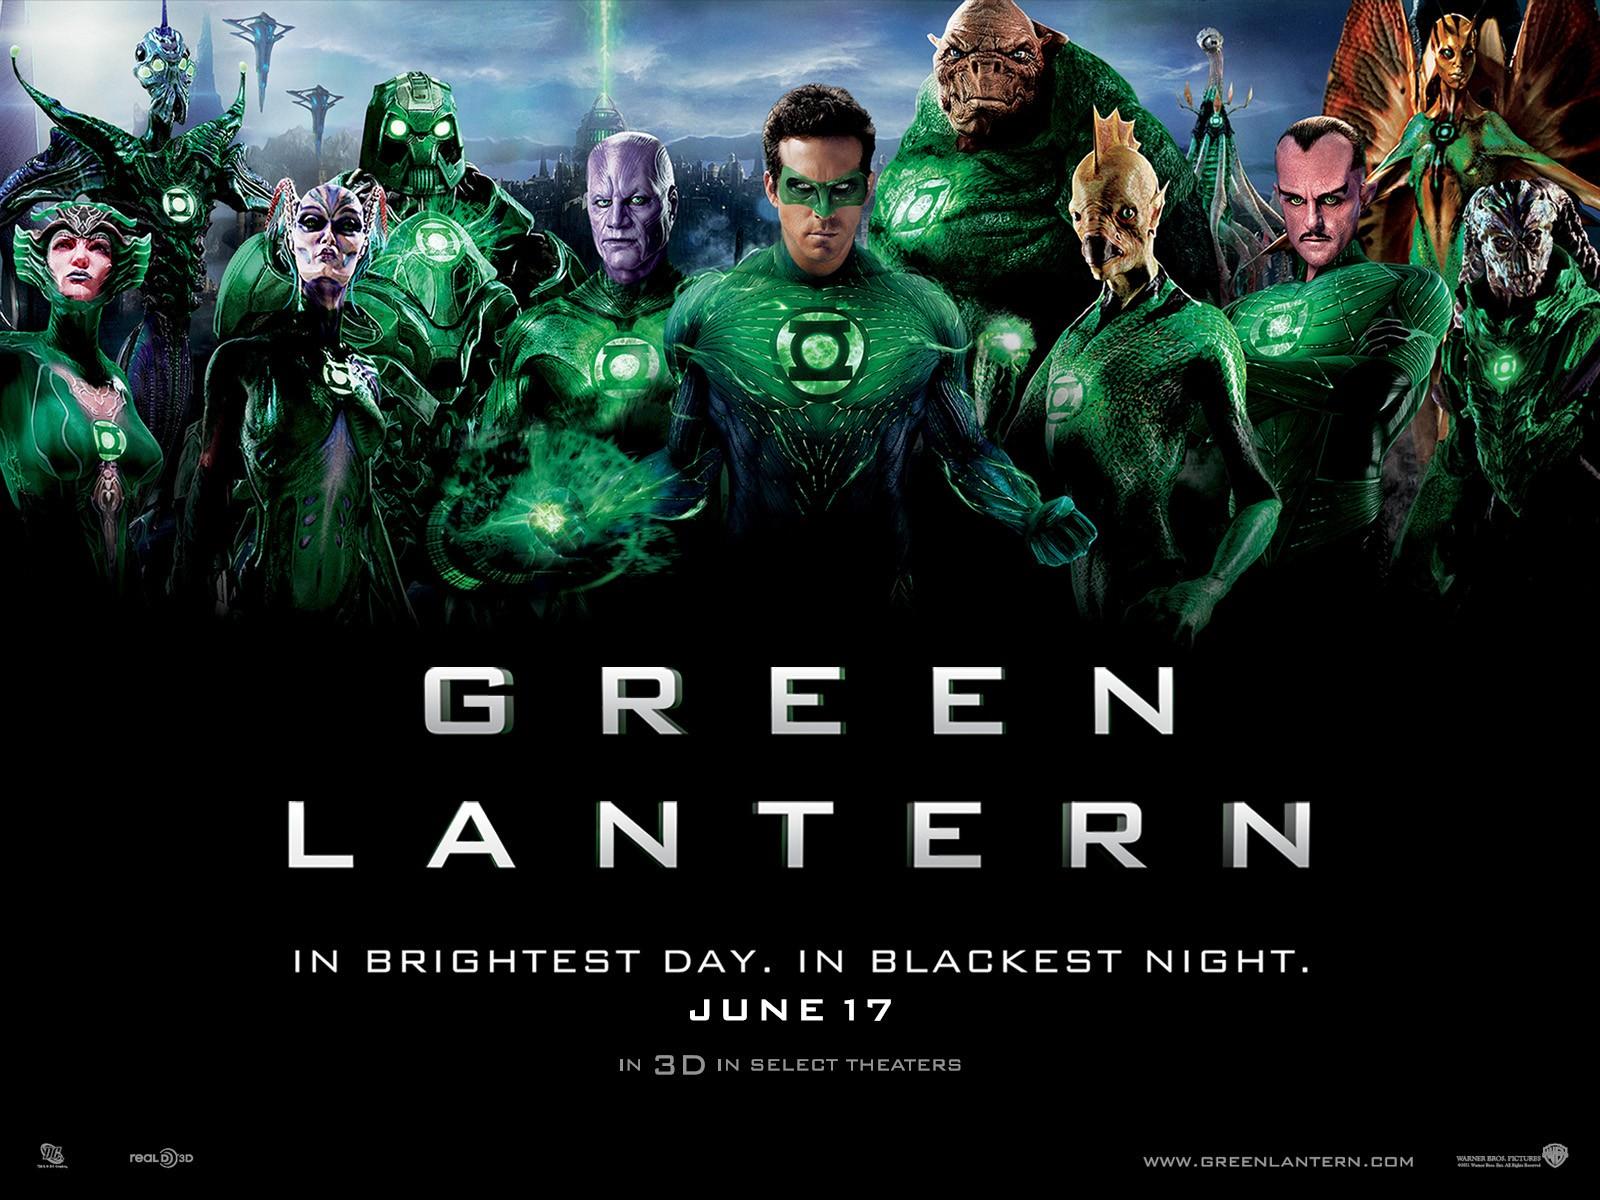 Green Lantern 2011 Film Wallpapers American science 1600x1200